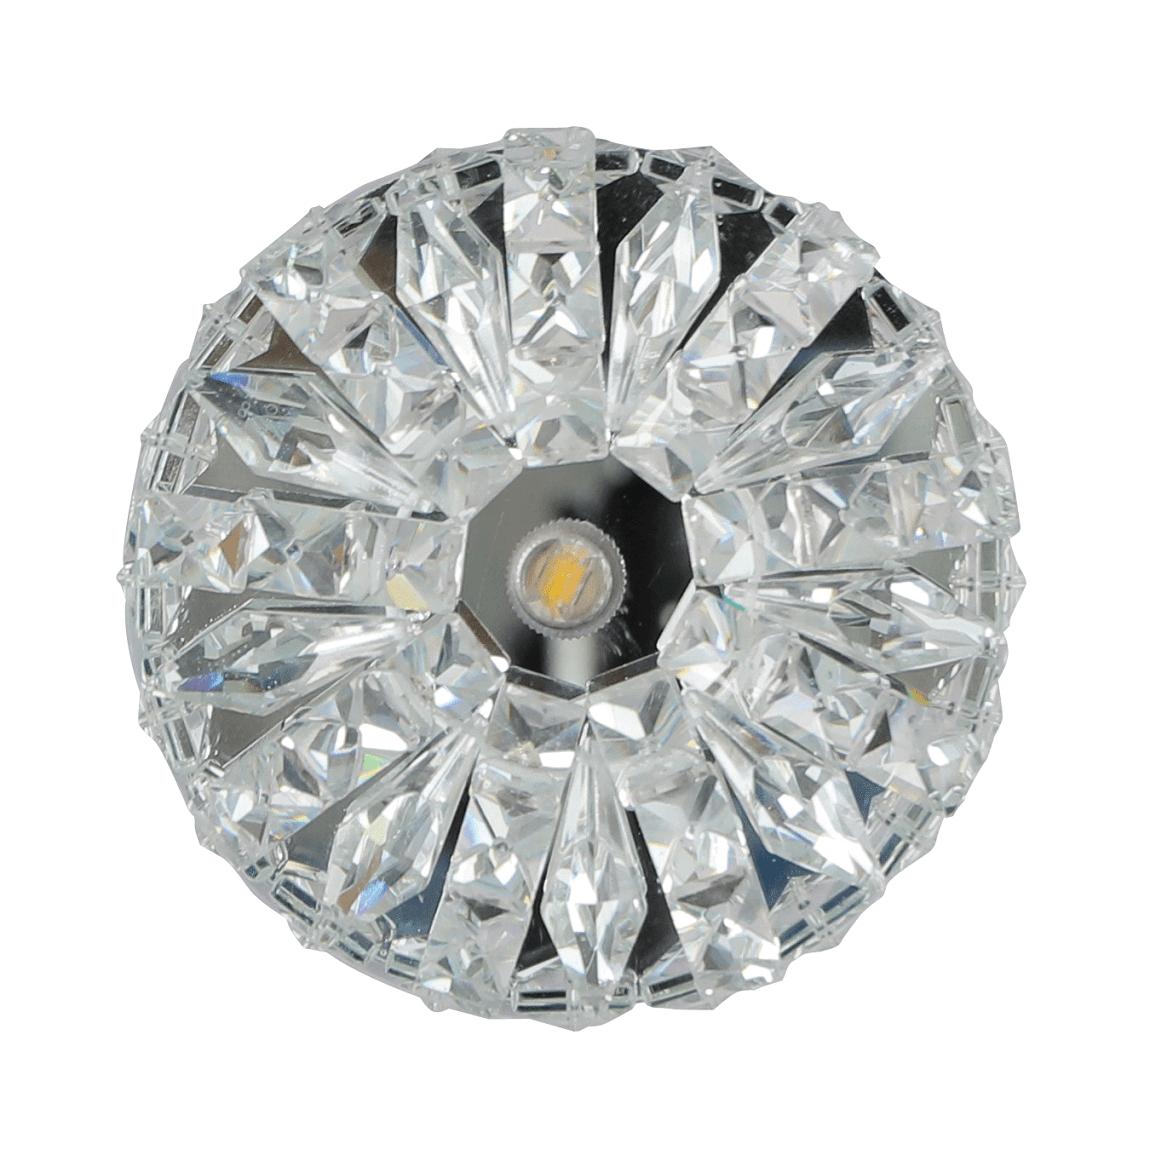 FORLIFE FL-1837 - 5 Watt Kristal LED Spot